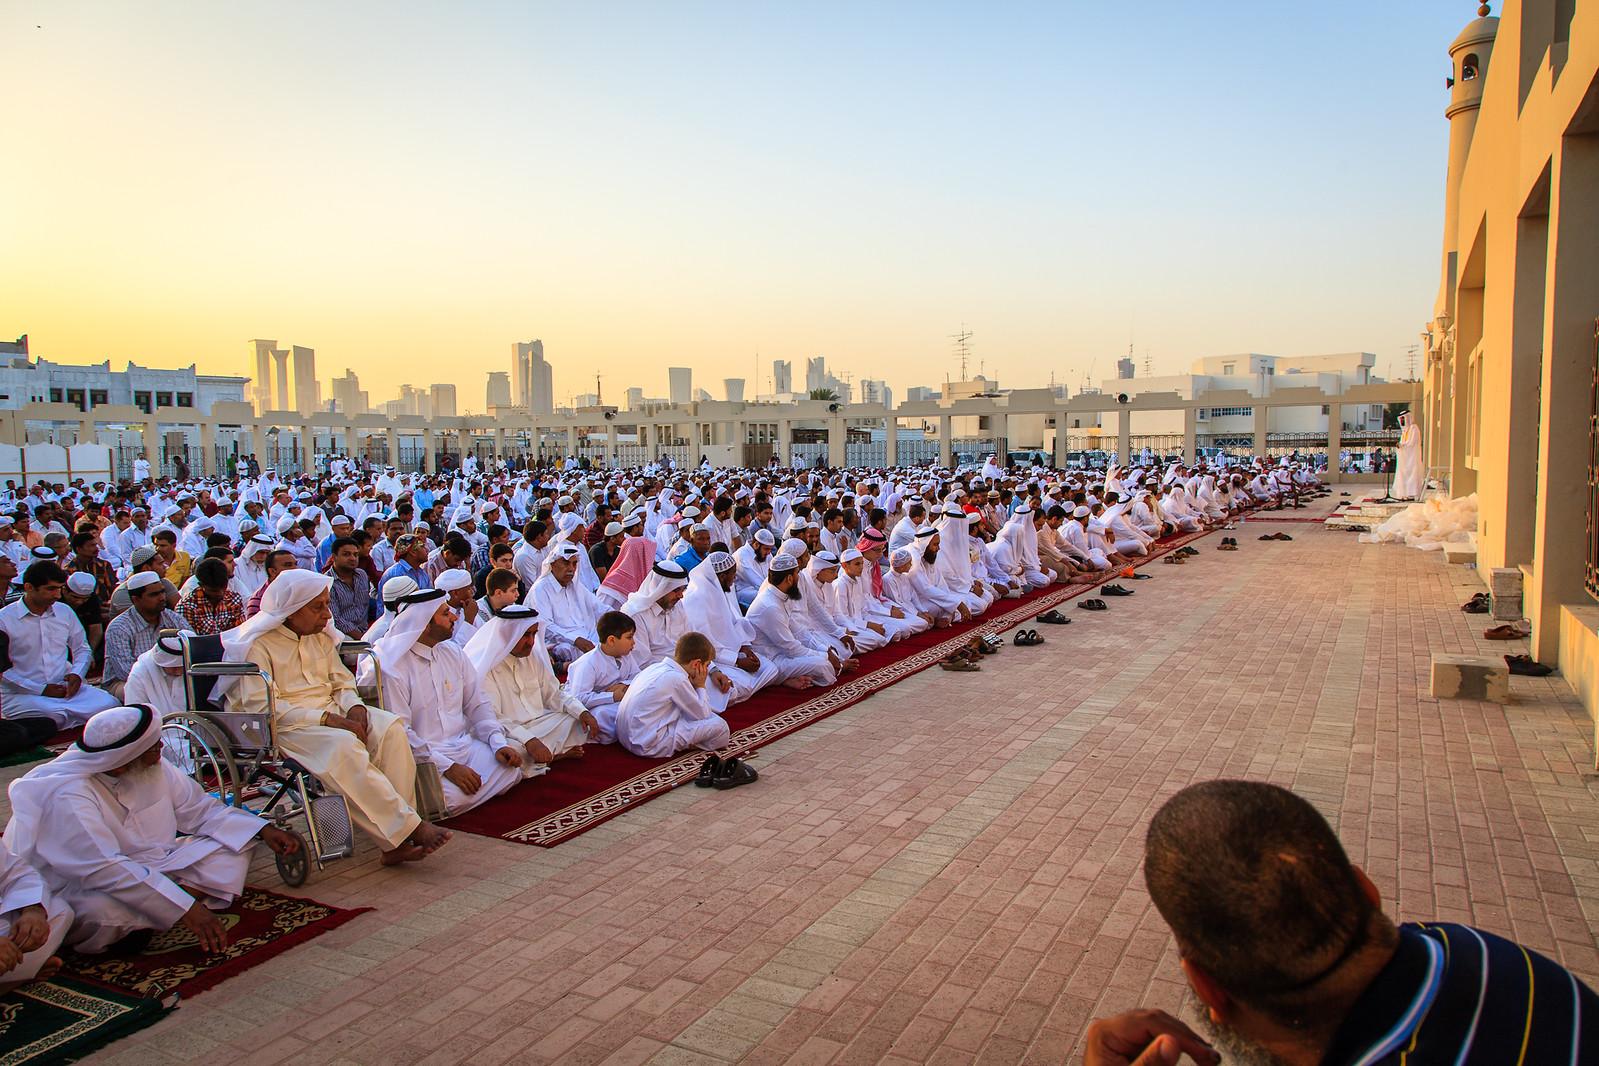 Congregating on Eid